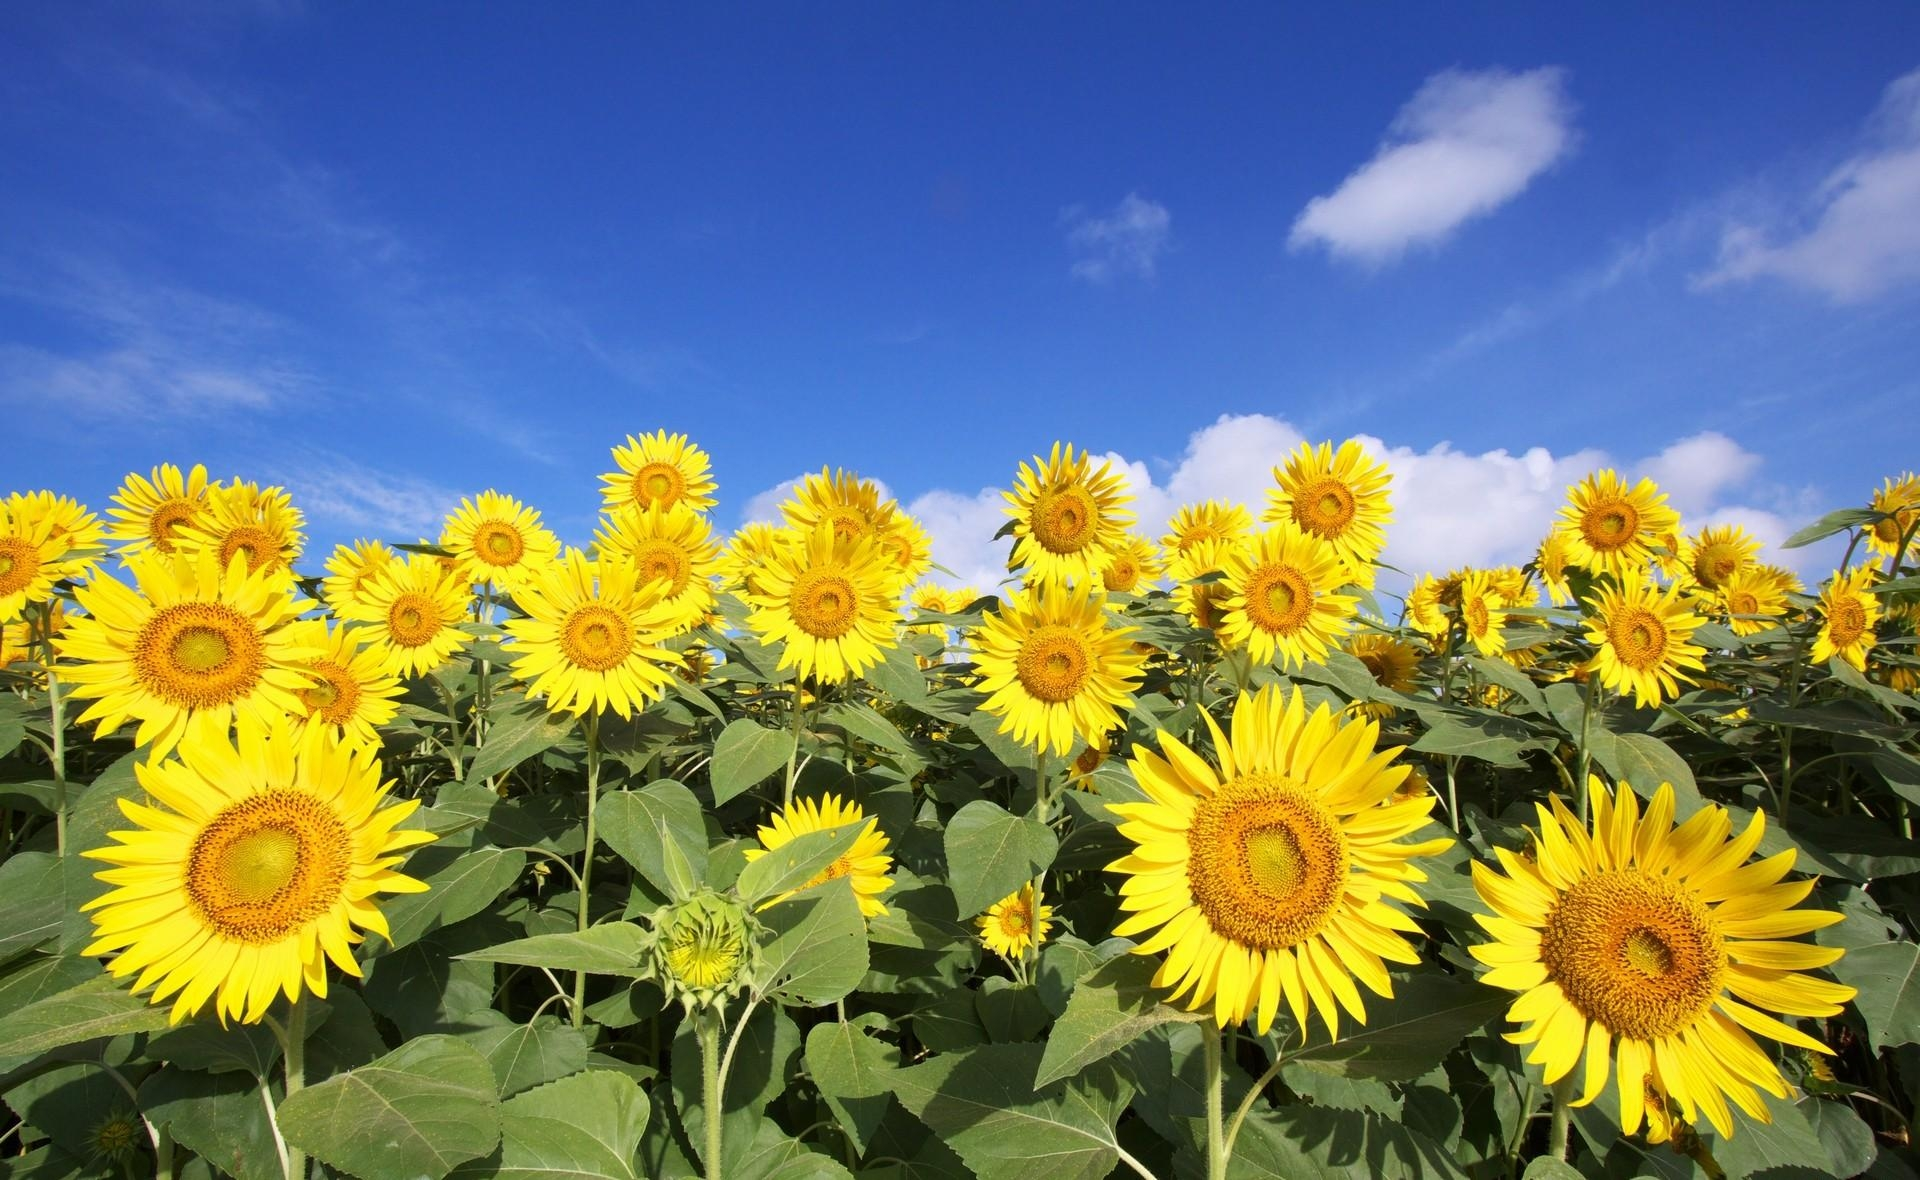 72893 Заставки и Обои Подсолнухи на телефон. Скачать Цветы, Небо, Облака, Солнечно, Поле, Подсолнухи картинки бесплатно